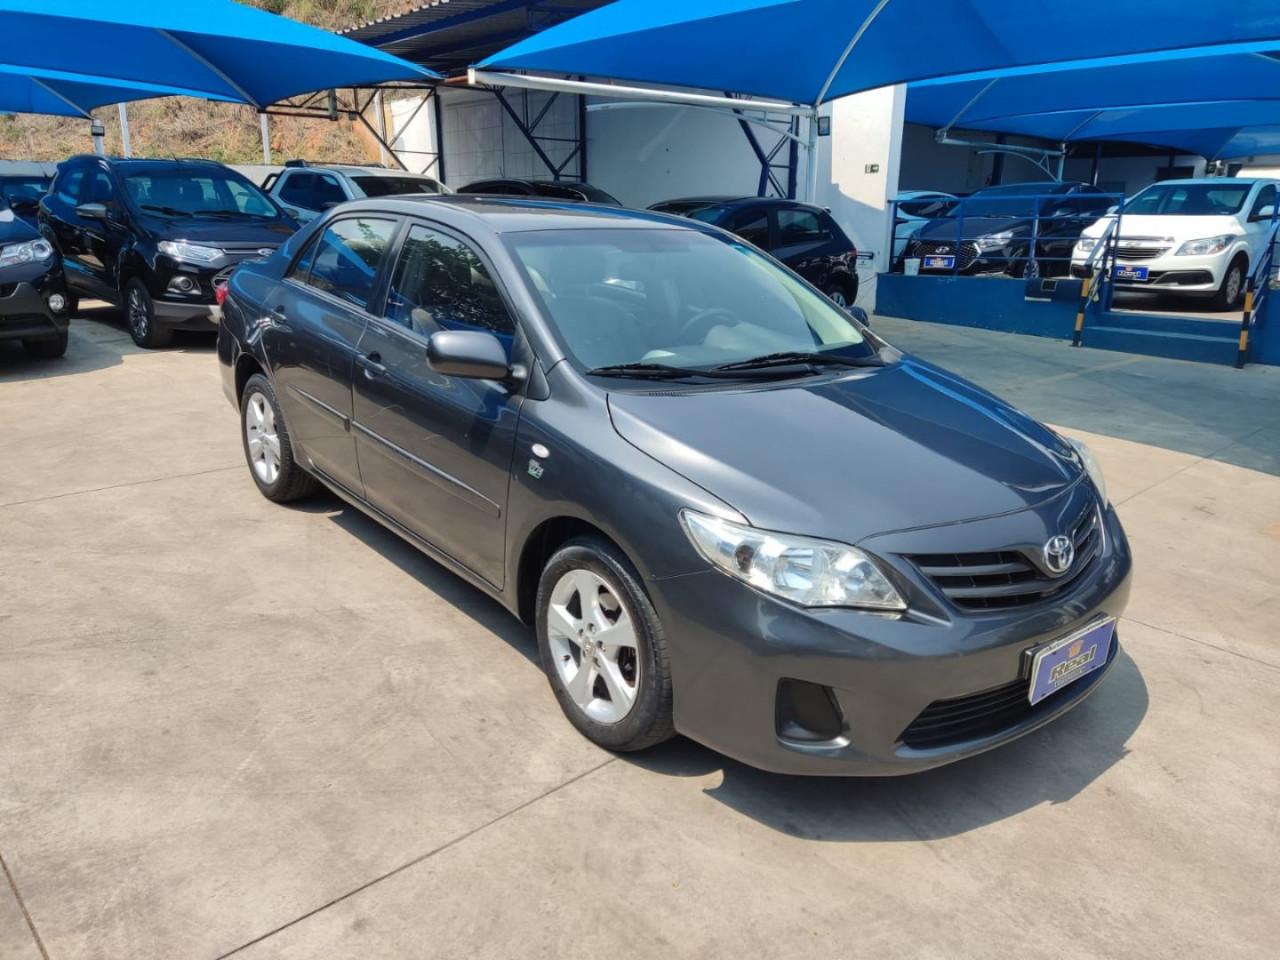 Corolla 1.8 16V 4P GLI FLEX